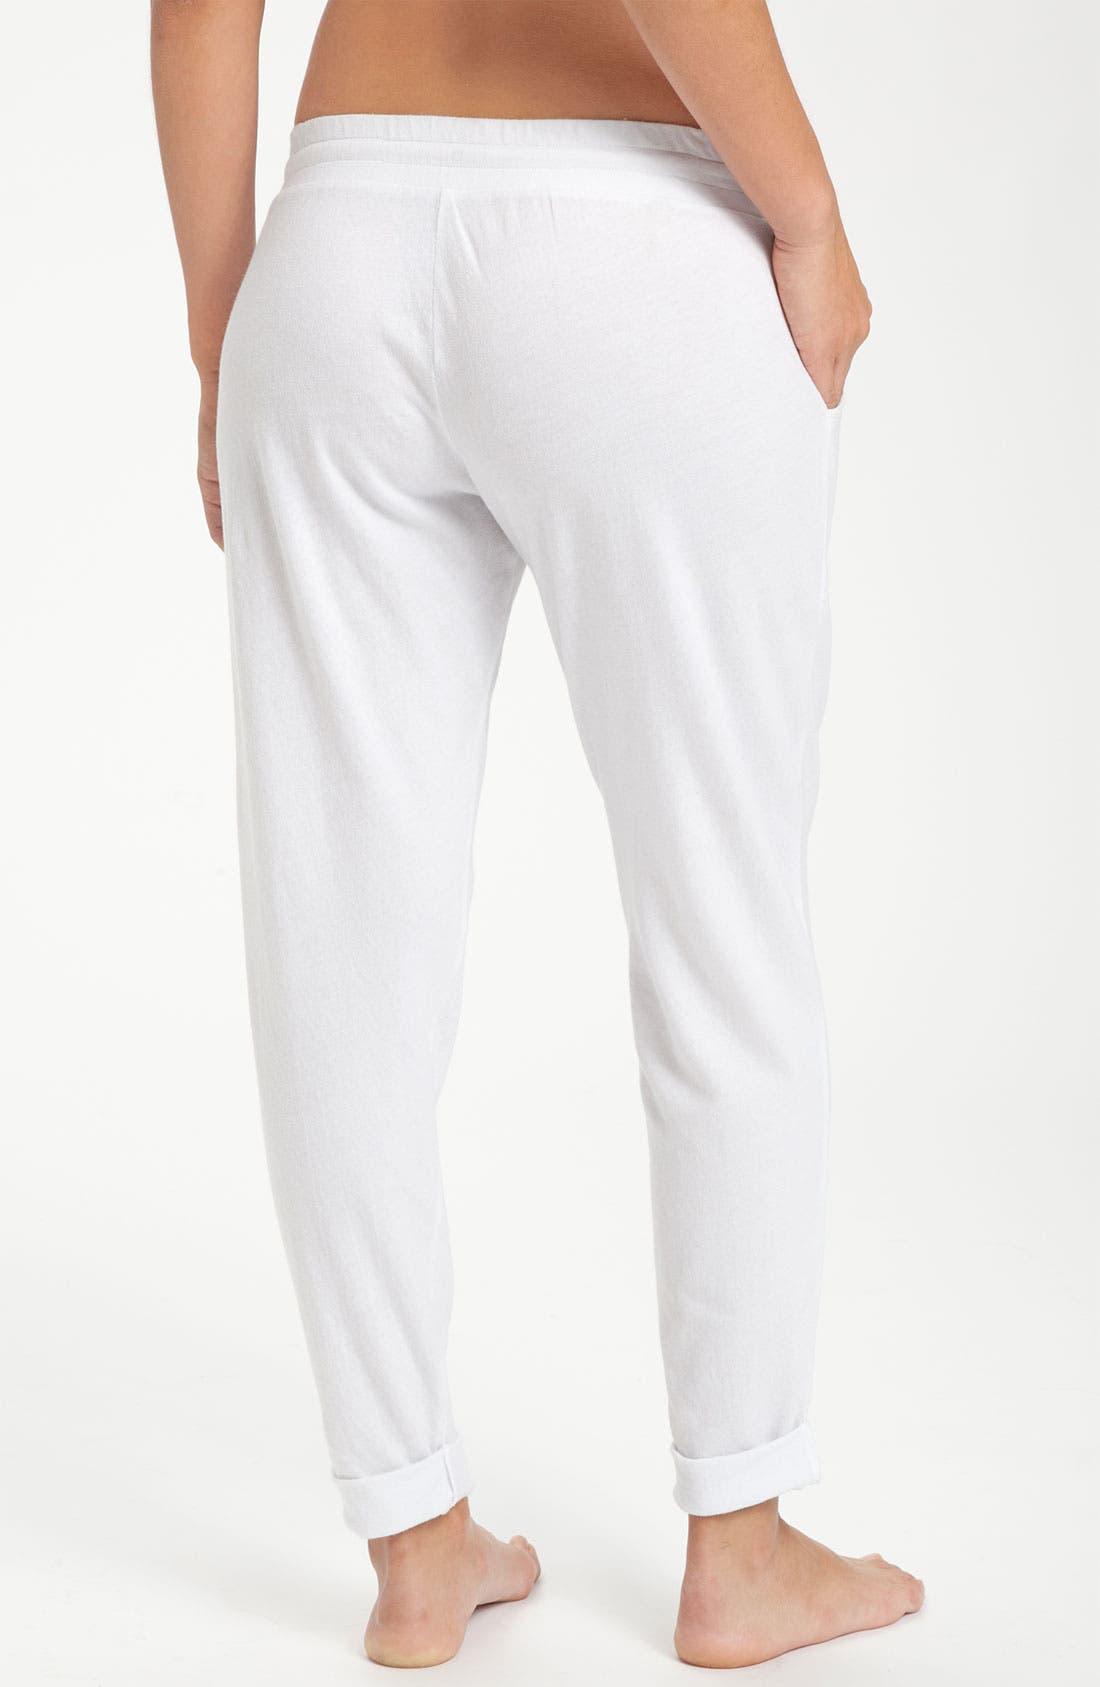 Alternate Image 2  - Make + Model 'Close to You' Crop Pants